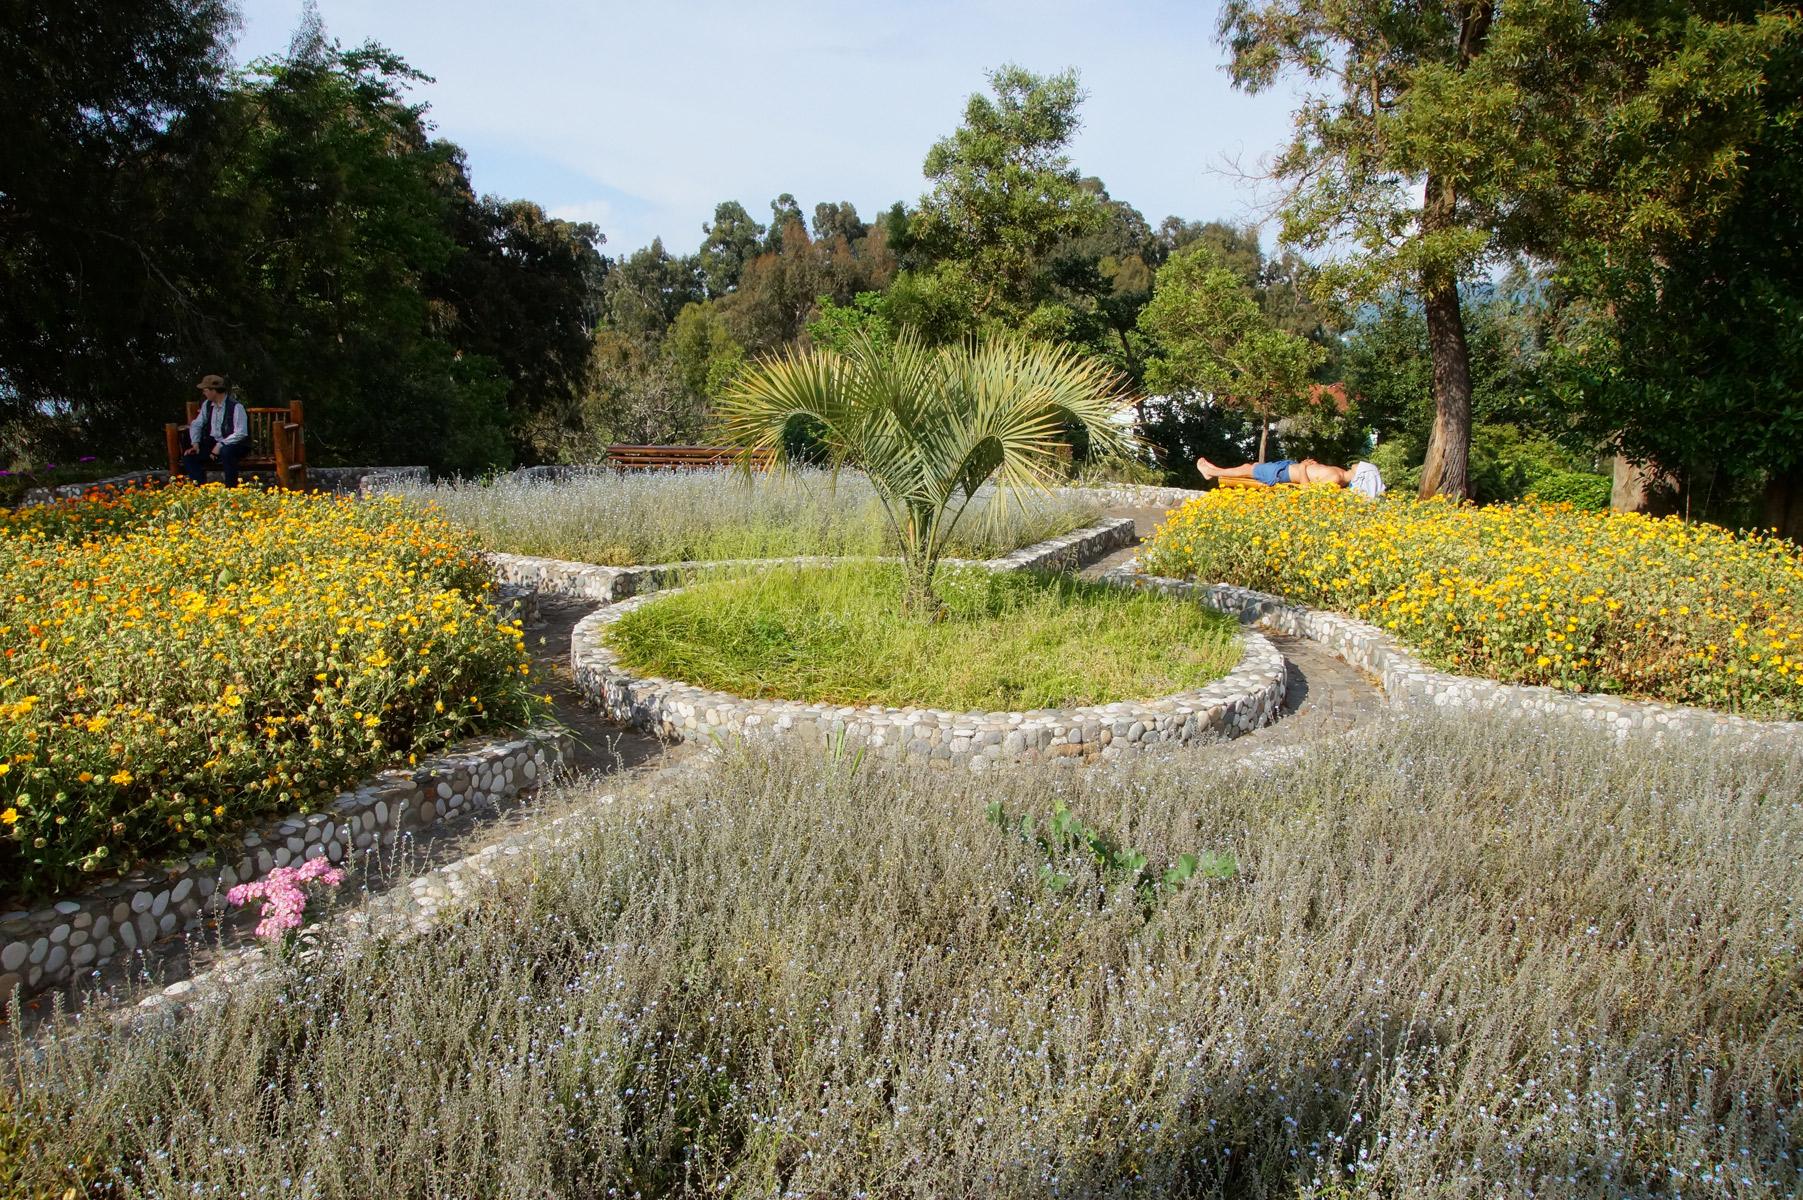 Ботанический сад, Батуми, Грузия, весна 2018